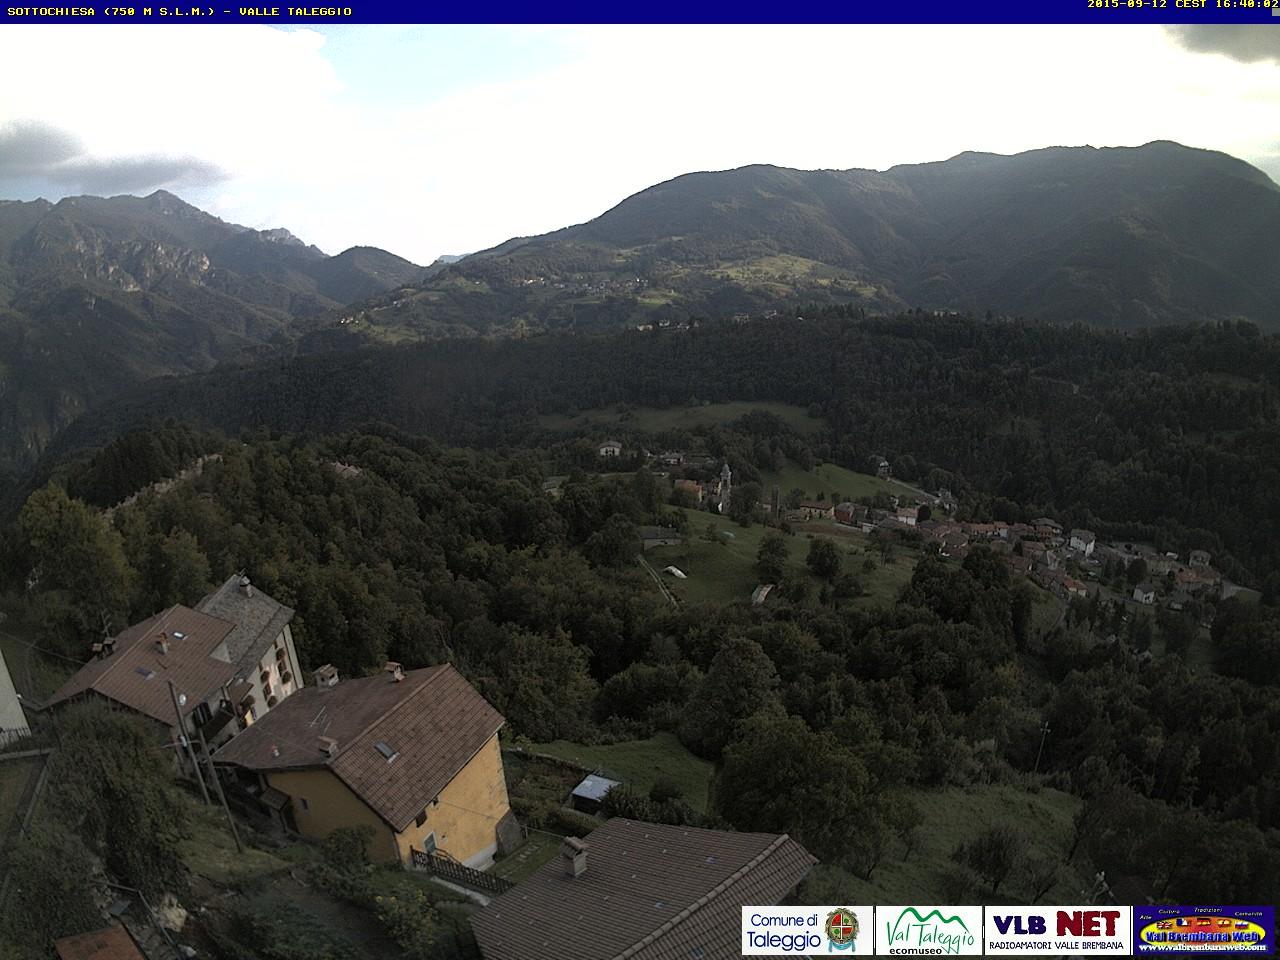 http://www.vallebrembana.org/webcam/Valle-Taleggio.jpg